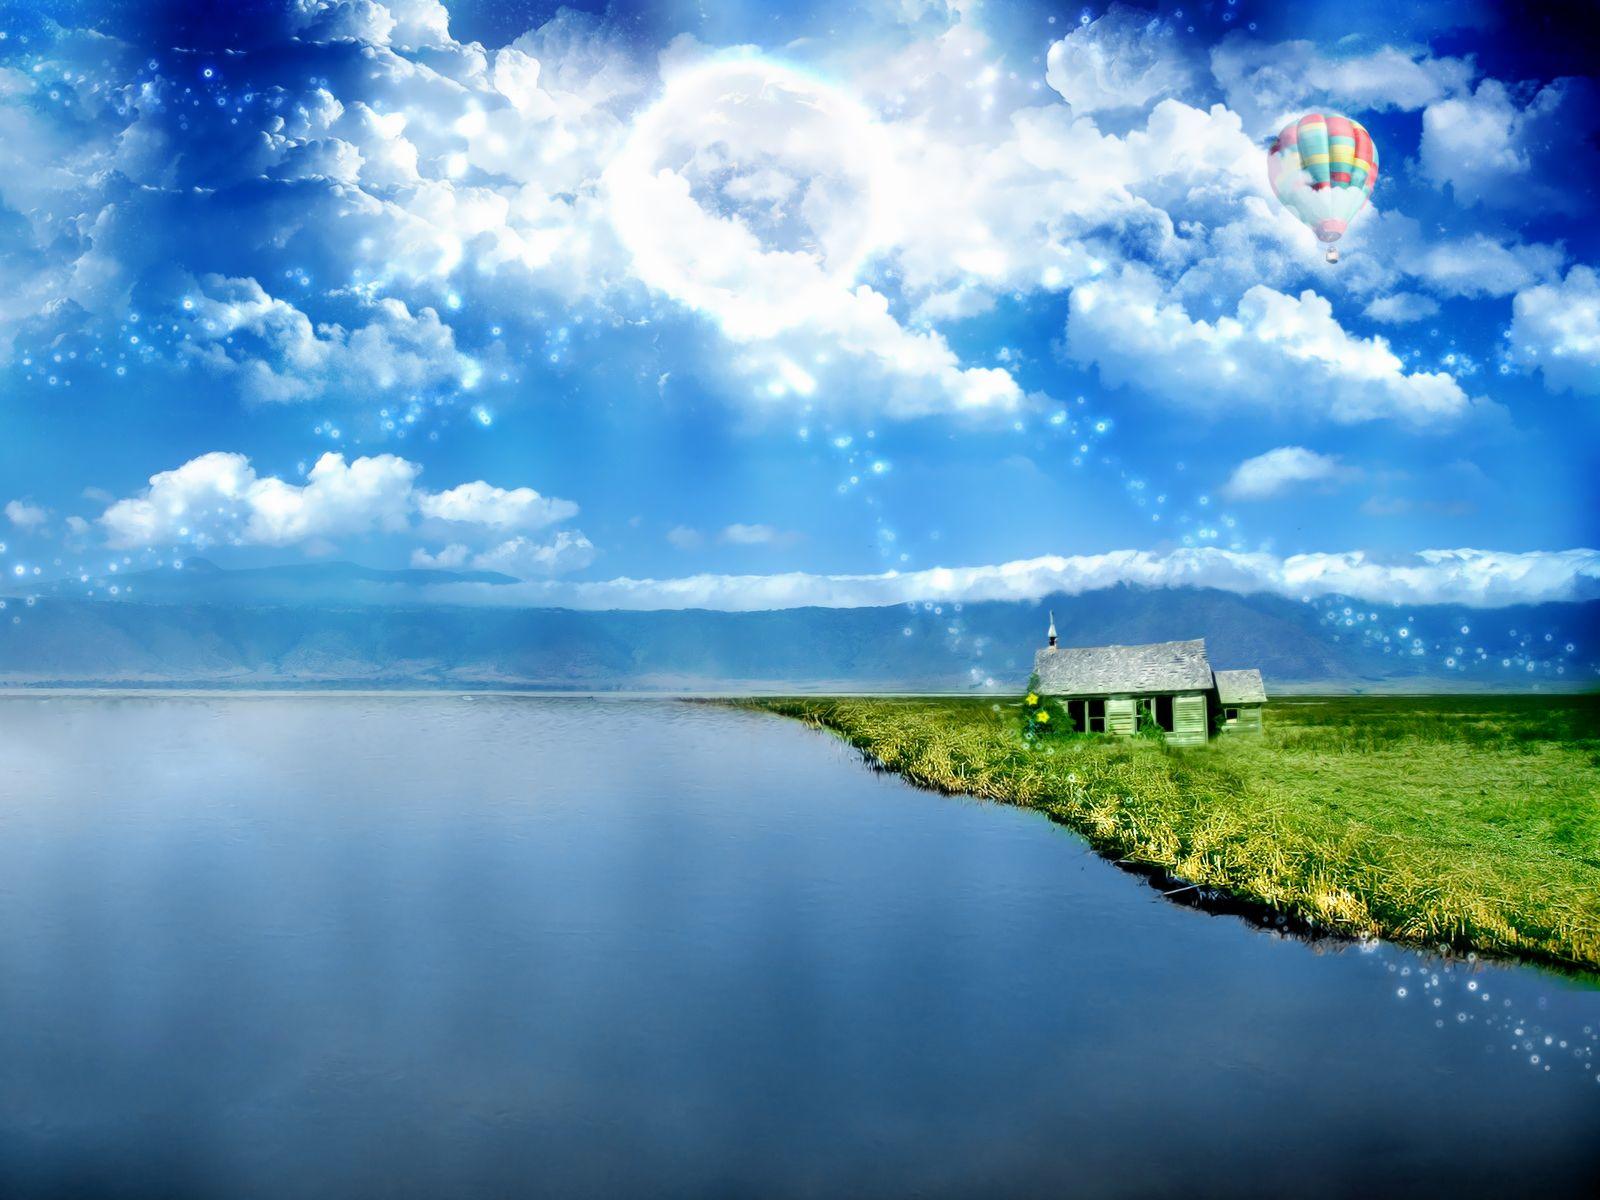 My dream world pictures Ankita Lokhande unseen photos Photos - m